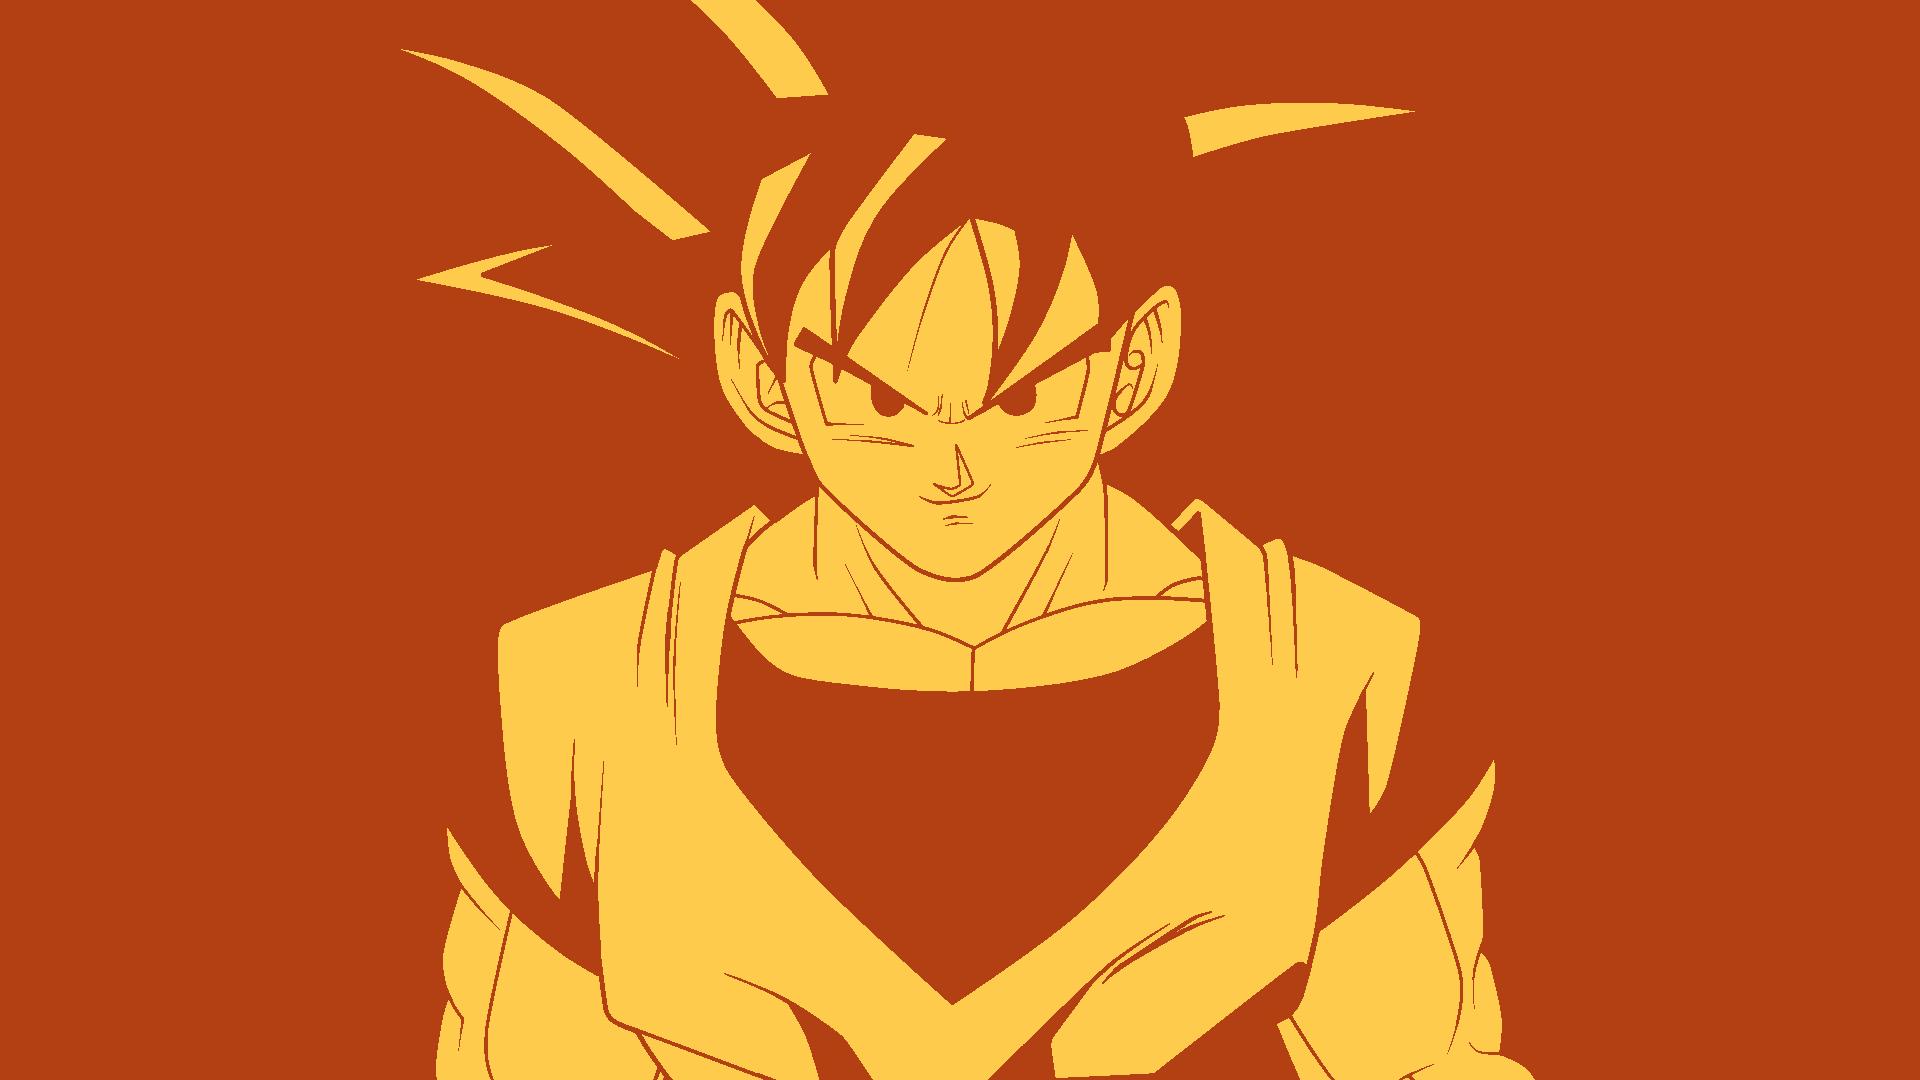 Son Goku   Minimalist Wallpaper HD by oracionscruffy on 1920x1080